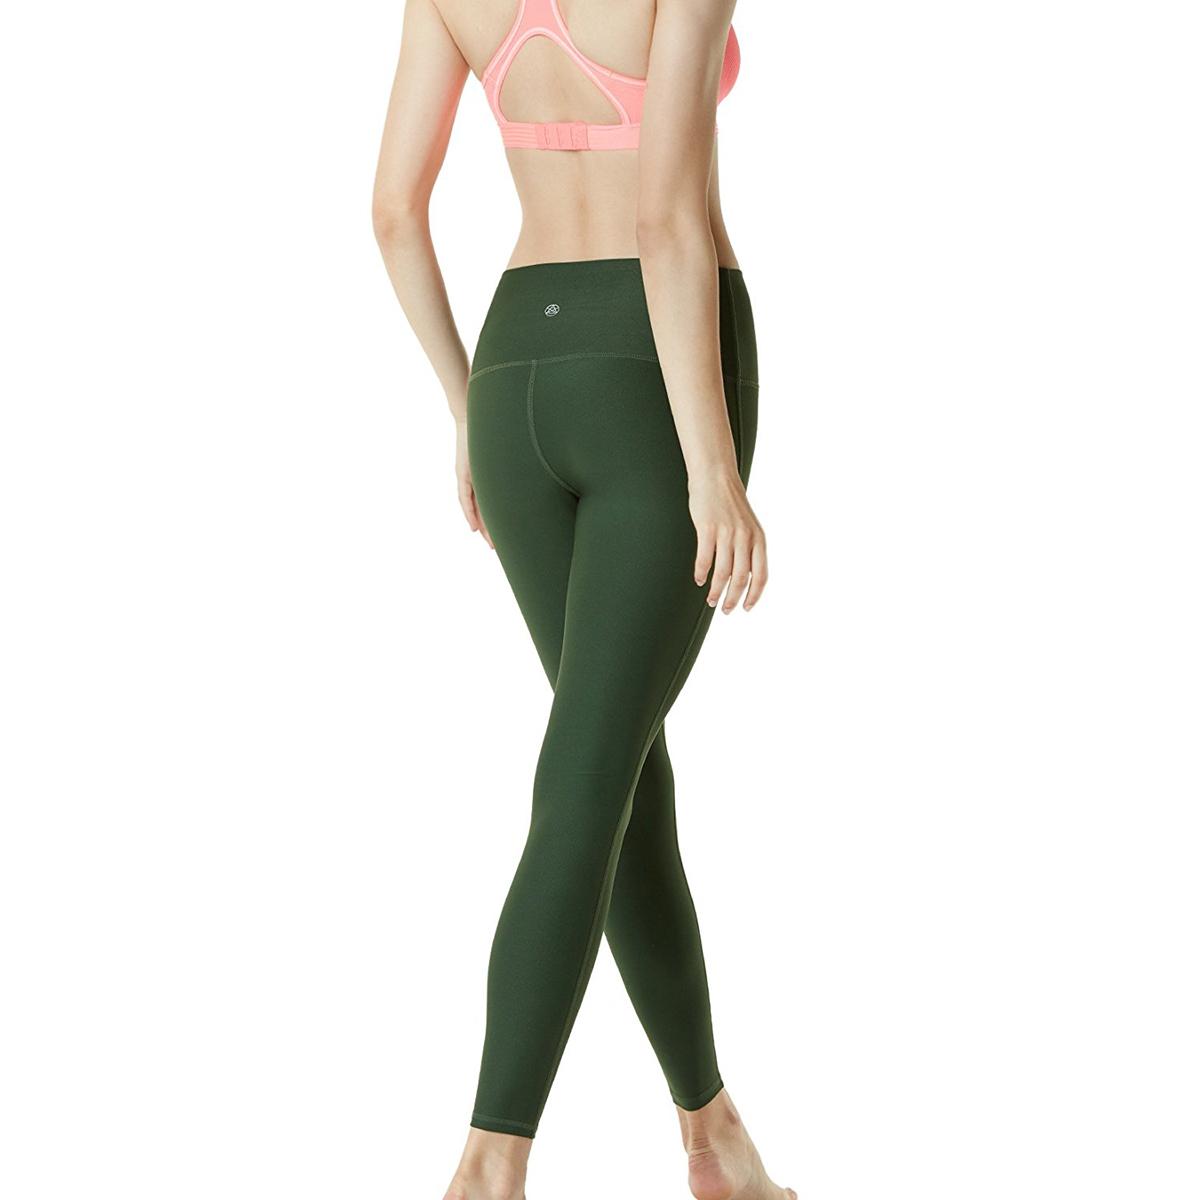 thumbnail 55 - TSLA Tesla FYP42 Women's High-Waisted Ultra-Stretch Tummy Control Yoga Pants